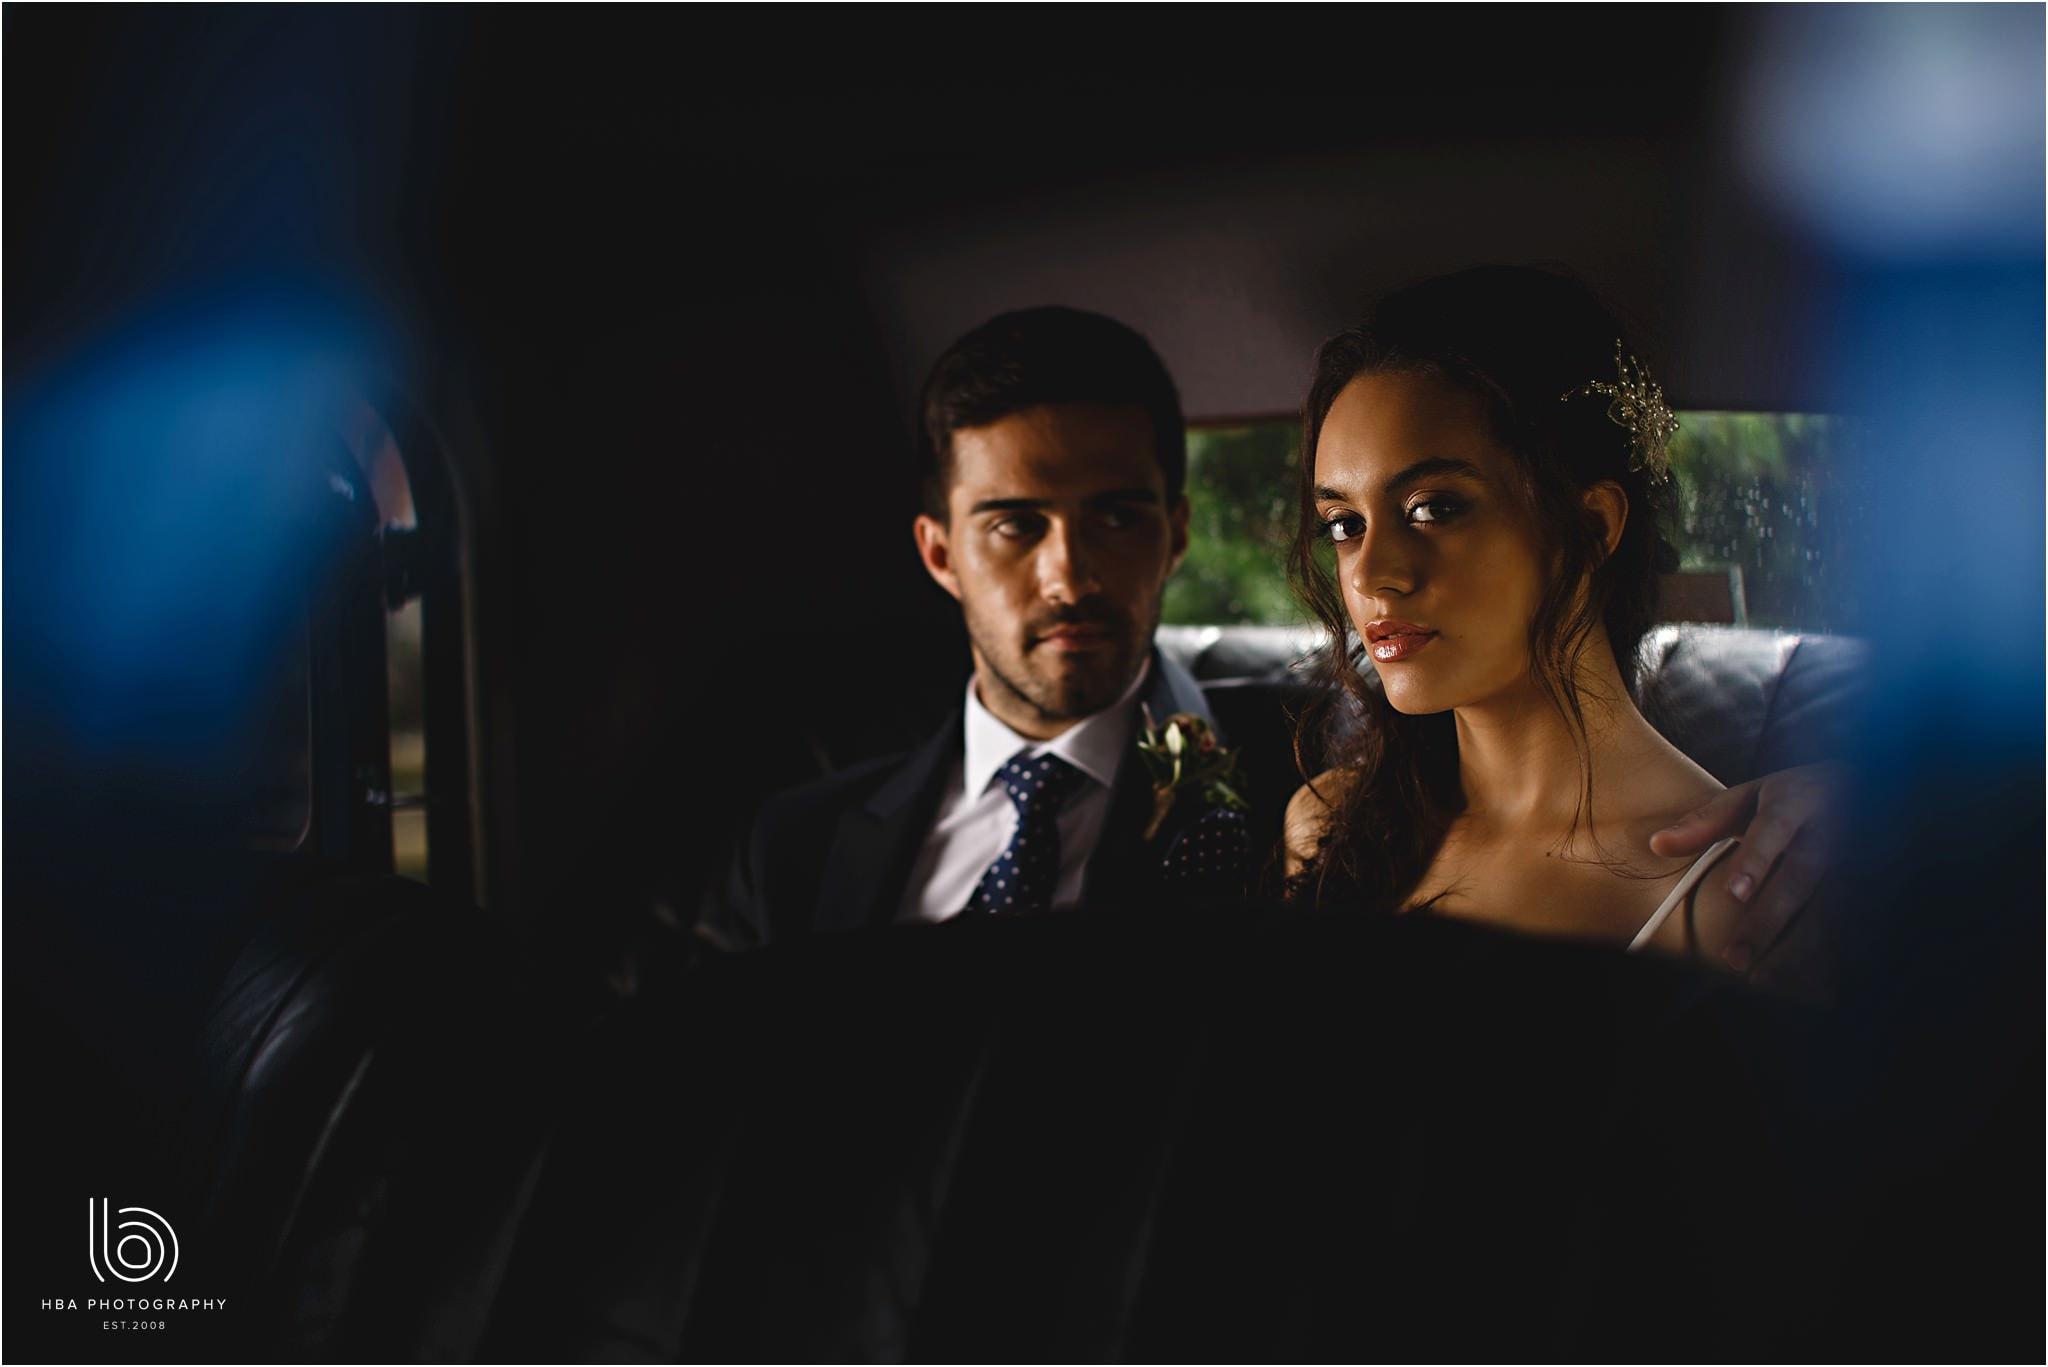 the bride and groom sat in the Bentley wedding car